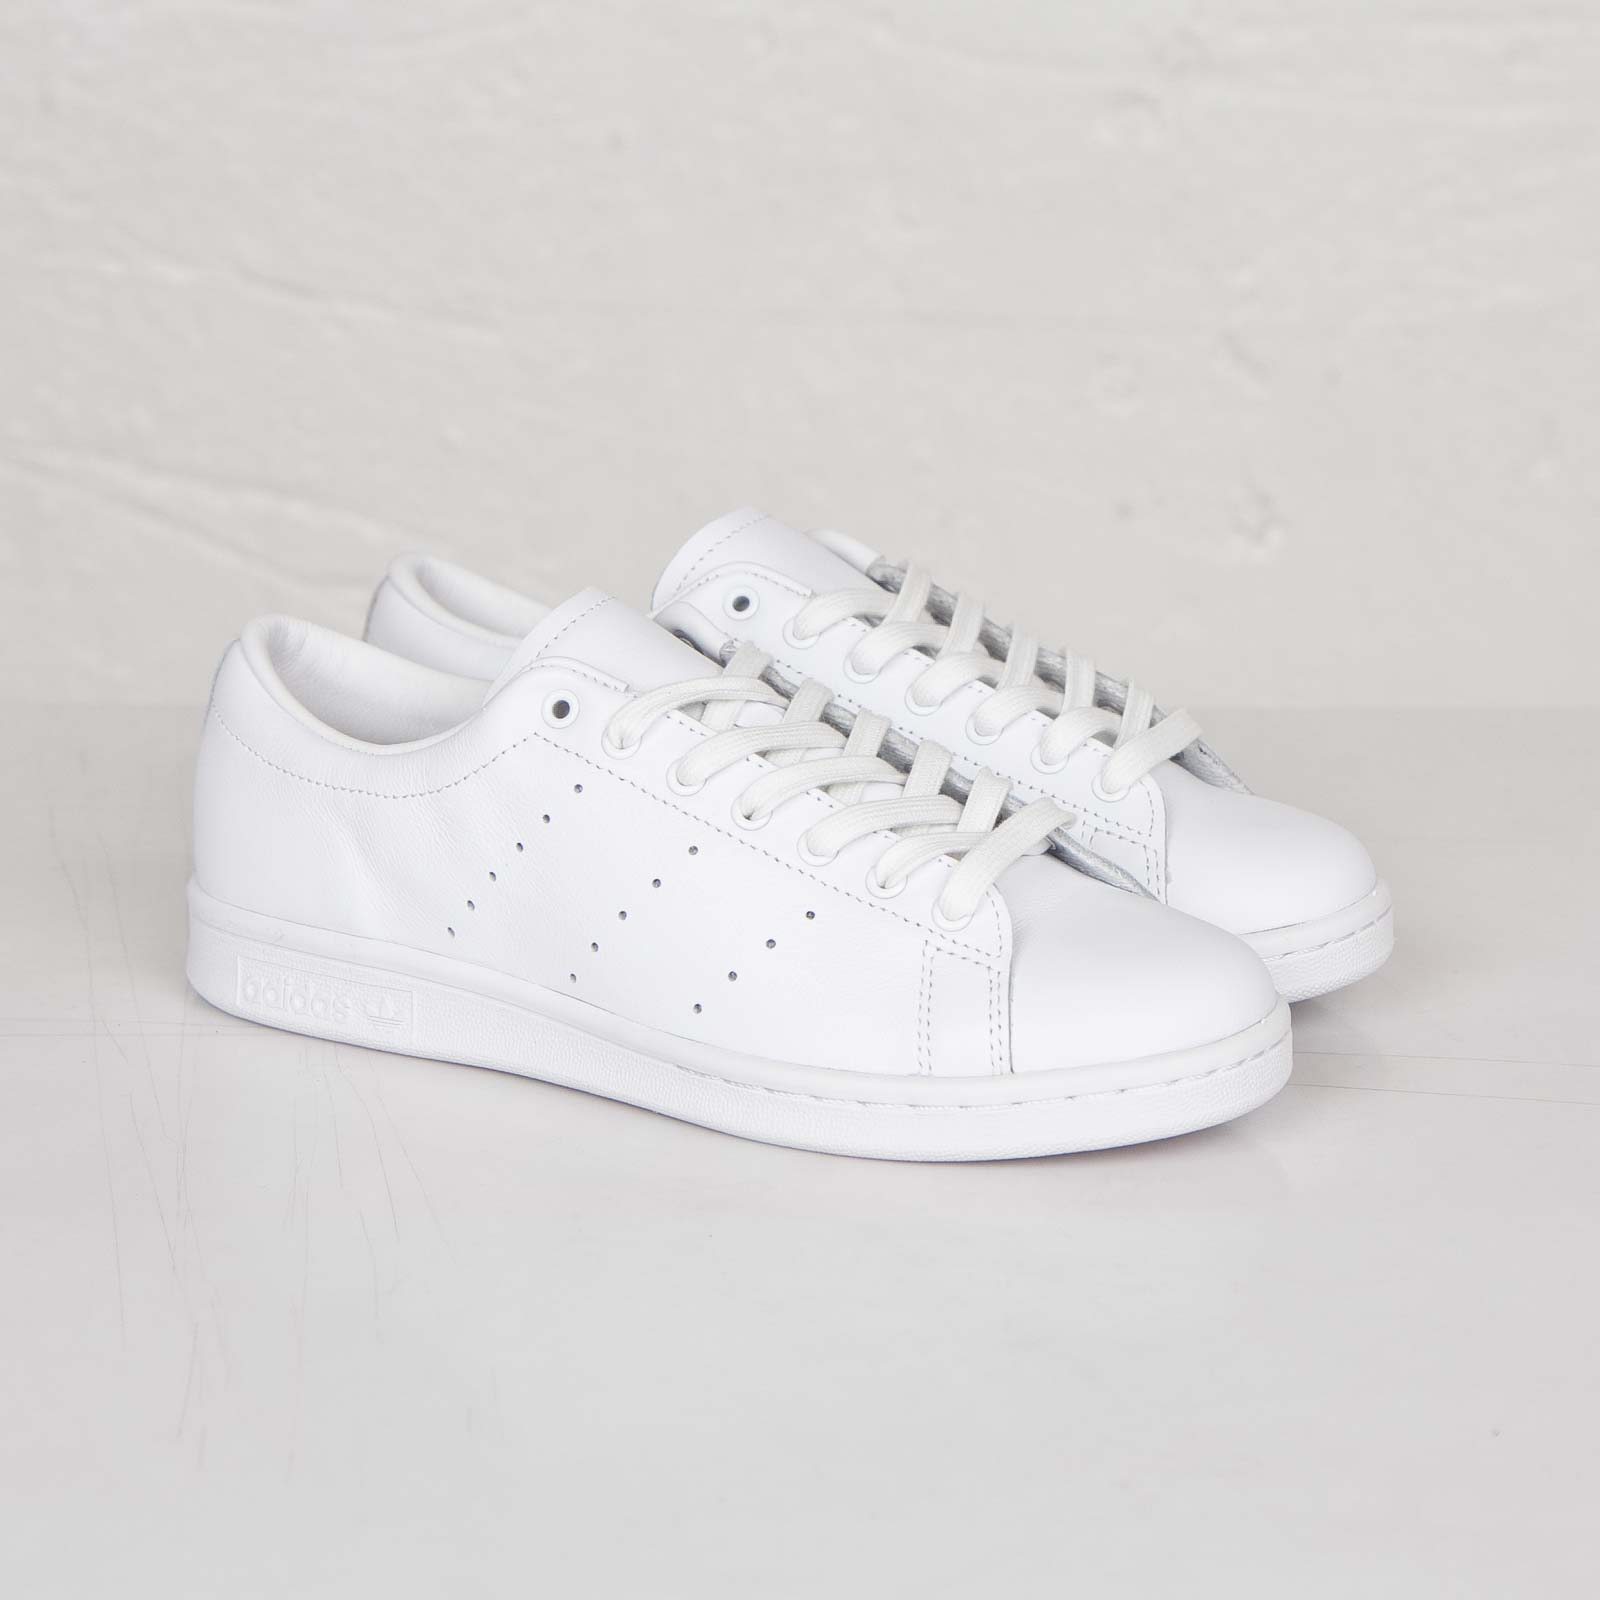 adidas Haillet Hyke B26101 Sneakersnstuff I Sneakers